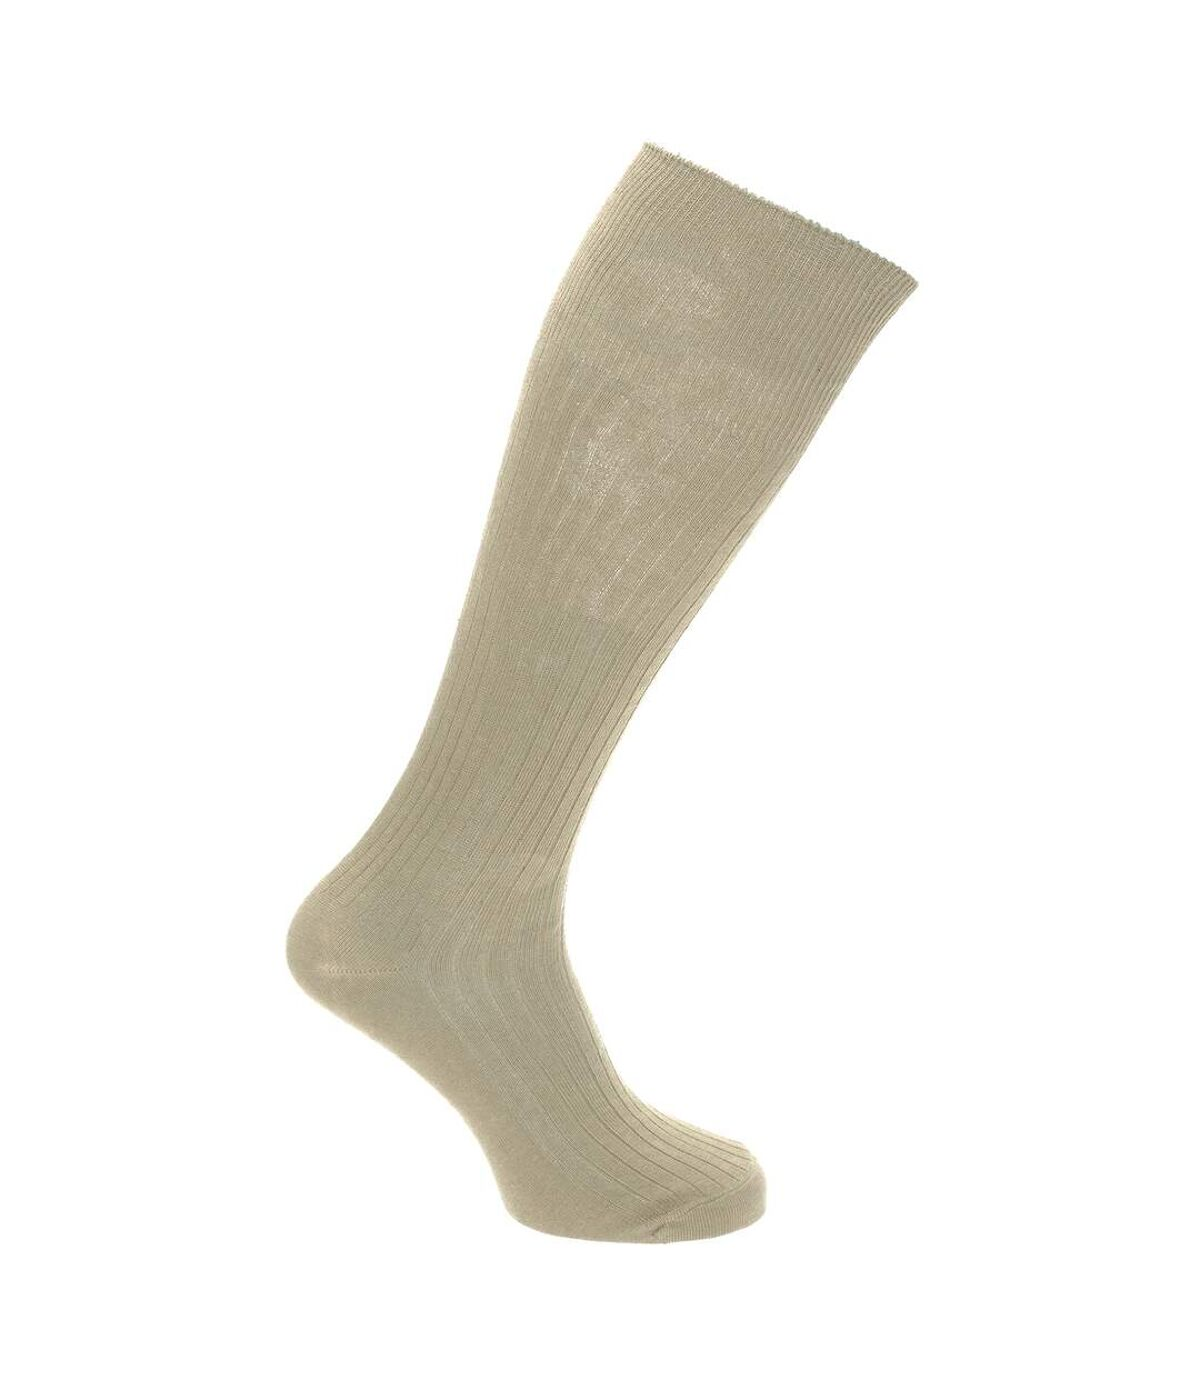 Mens 100% Cotton Ribbed Knee High Socks (Pack Of 3) (Brown/Light Grey/Cream) - UTMB489